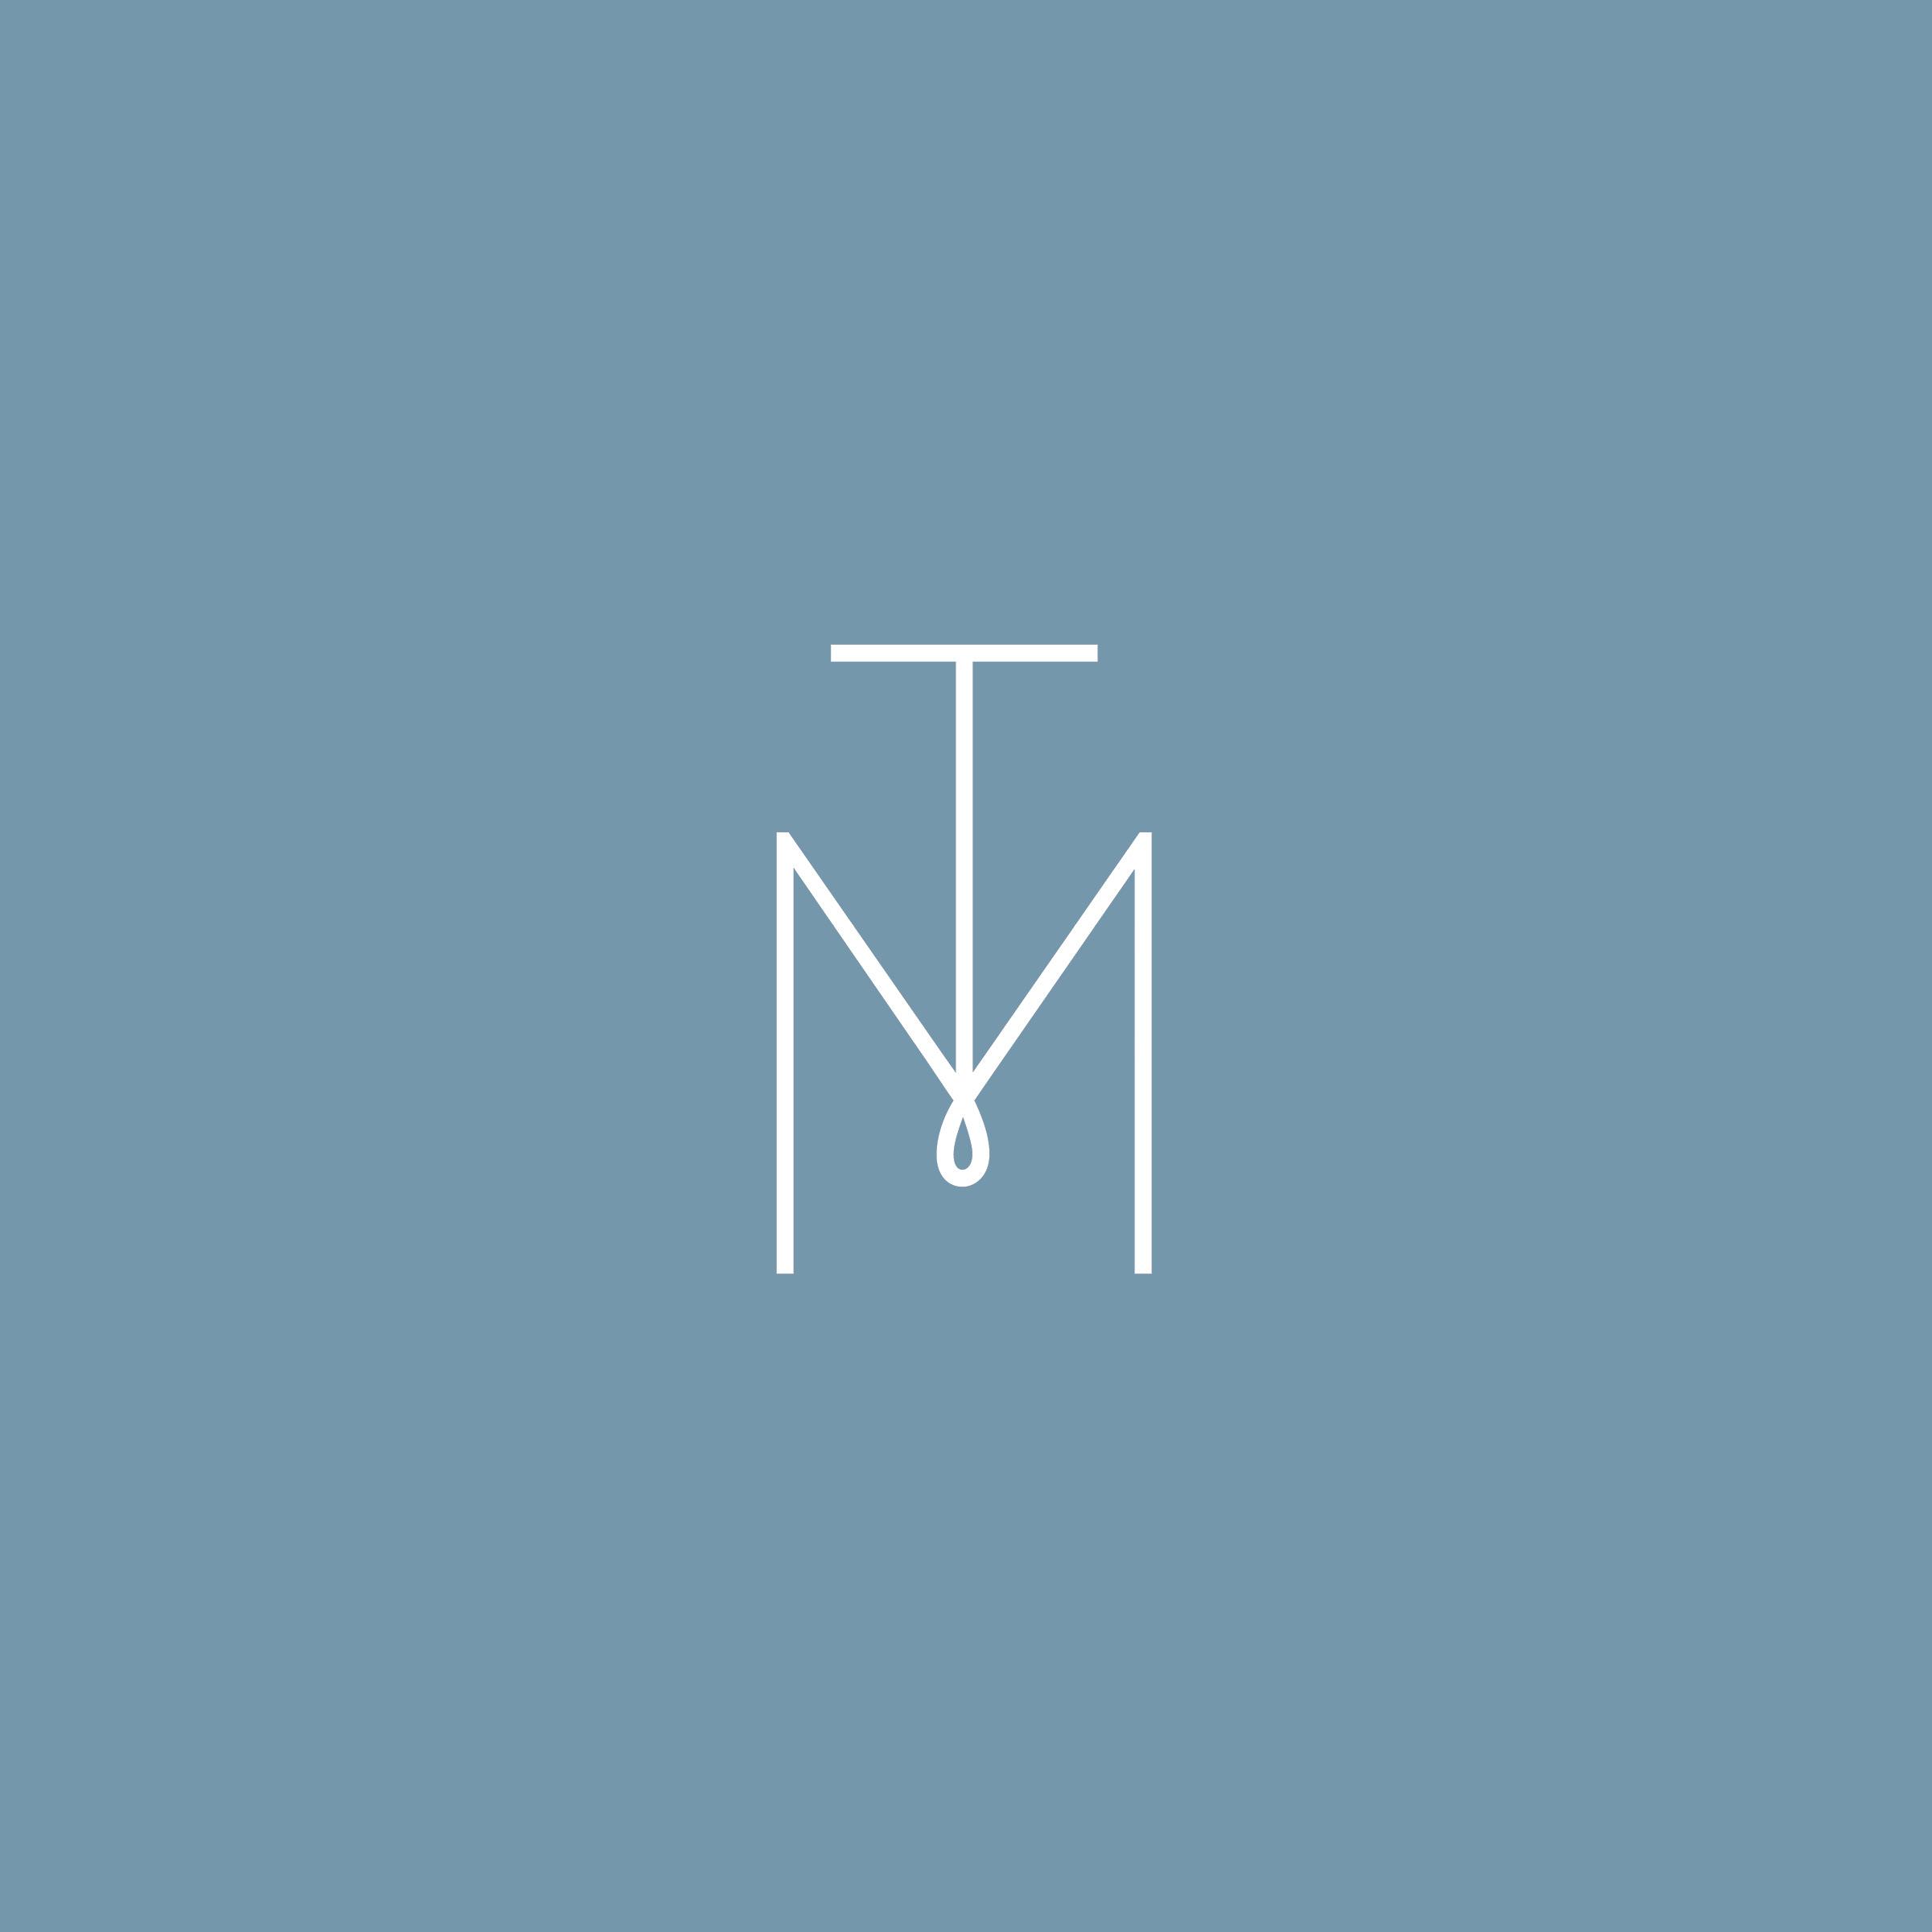 Tara_Straight Brandmark on Blue.jpg